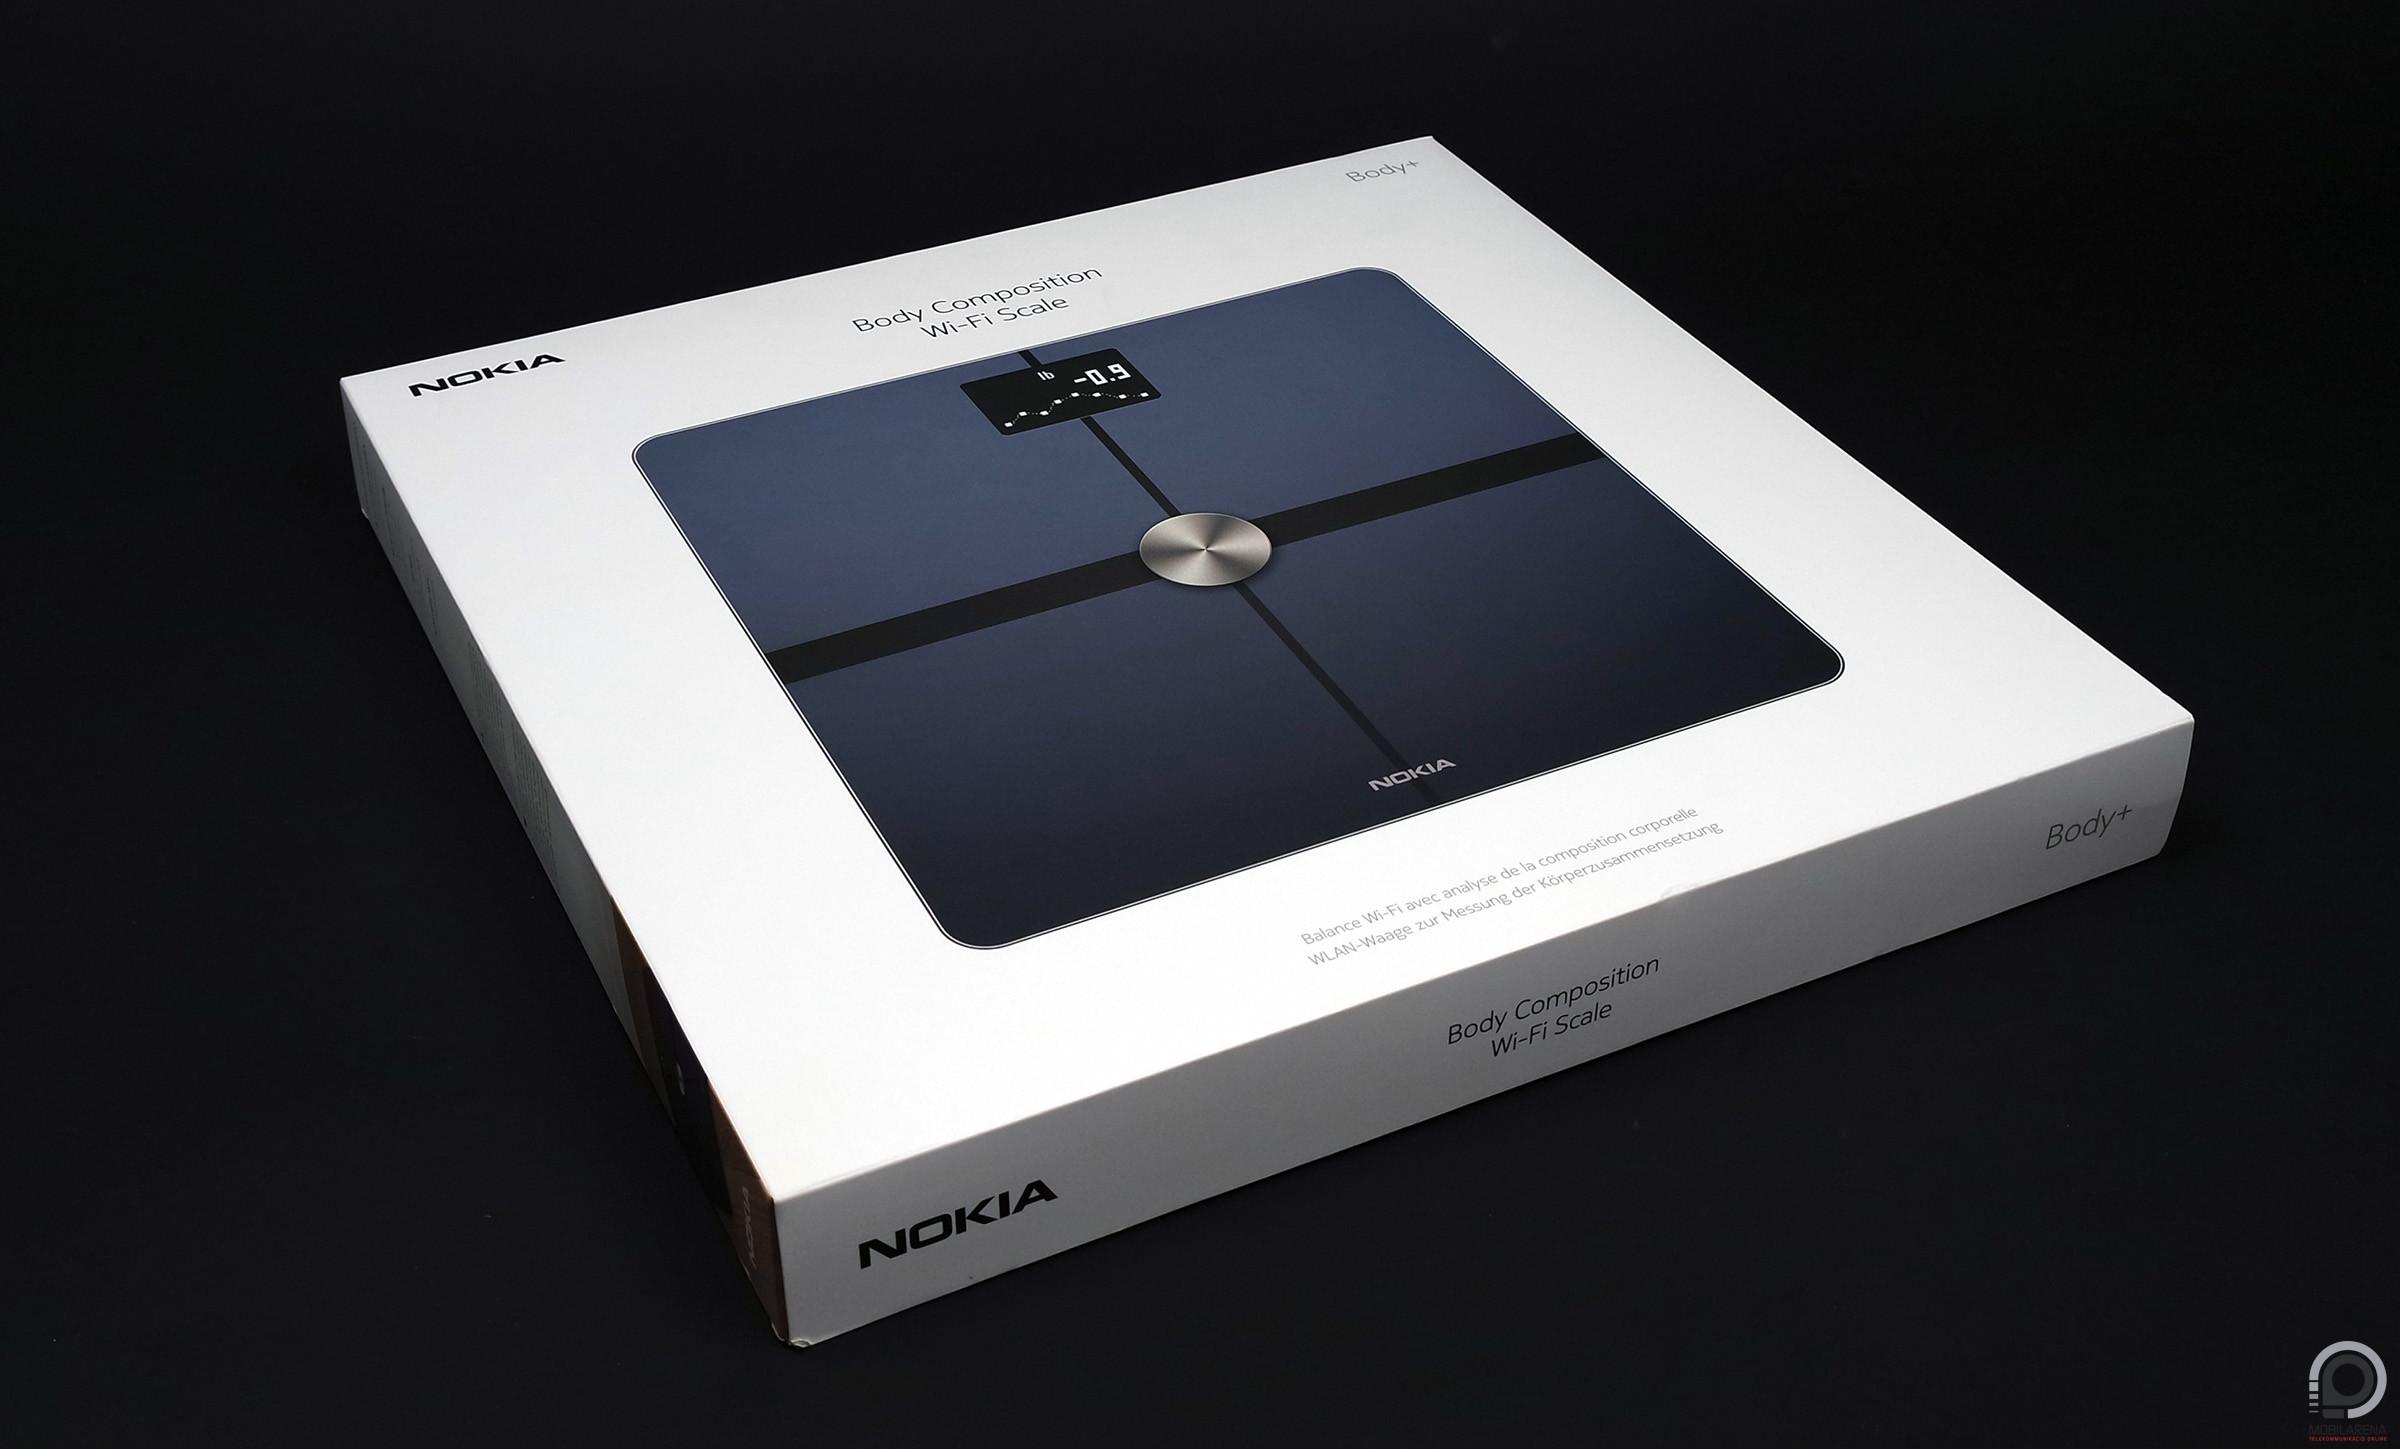 Nokia Steel és Body+ - skandináv minimalizmus c0de7338bb